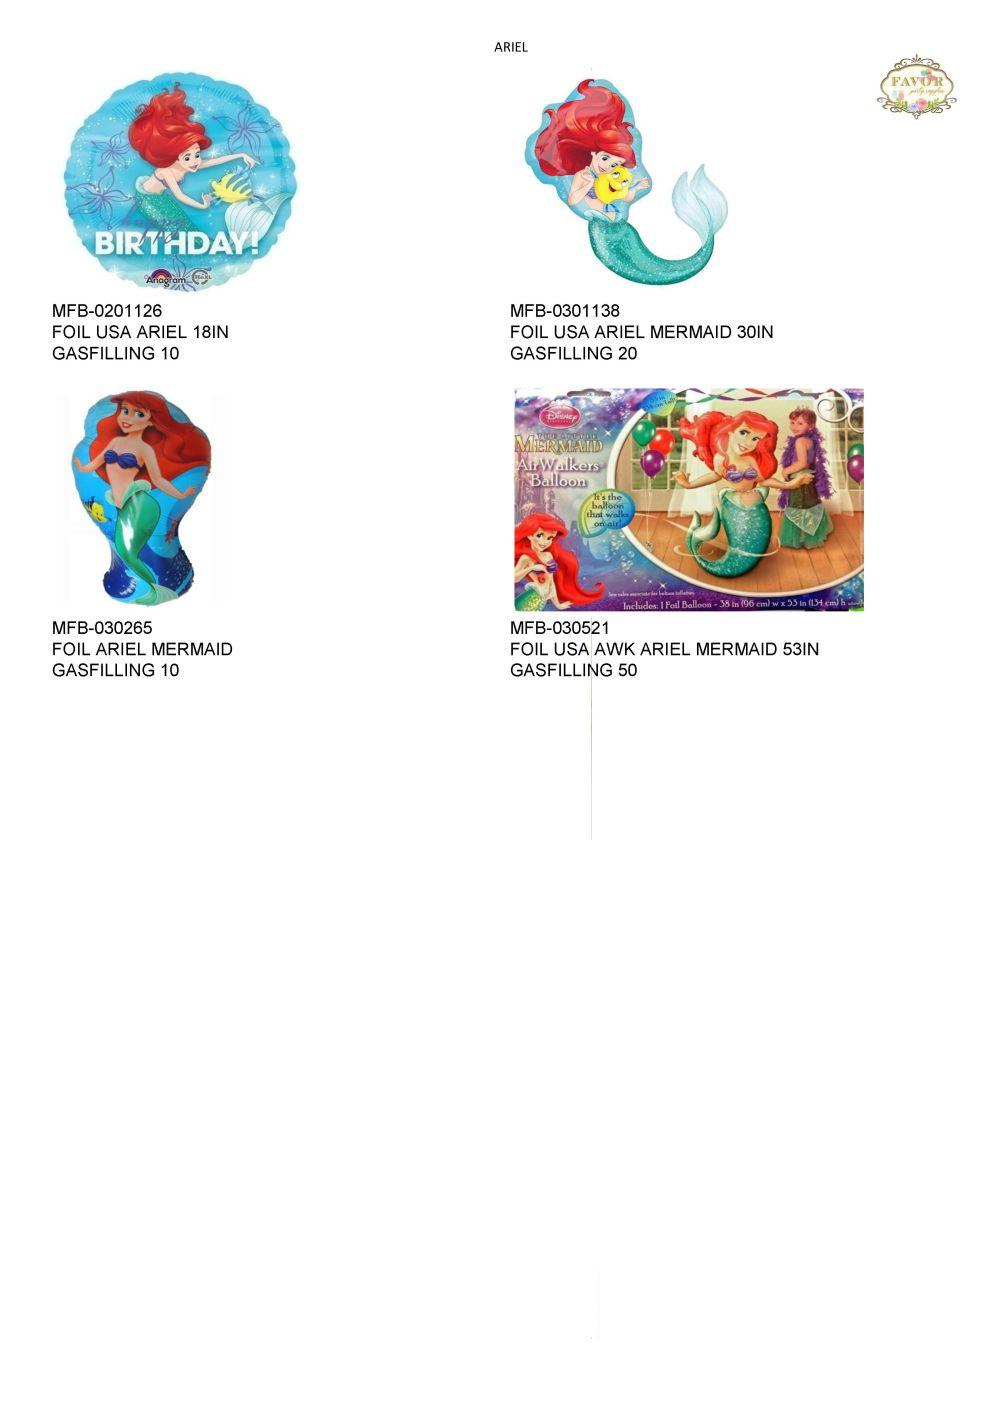 katalog ariel mermaid.jpg